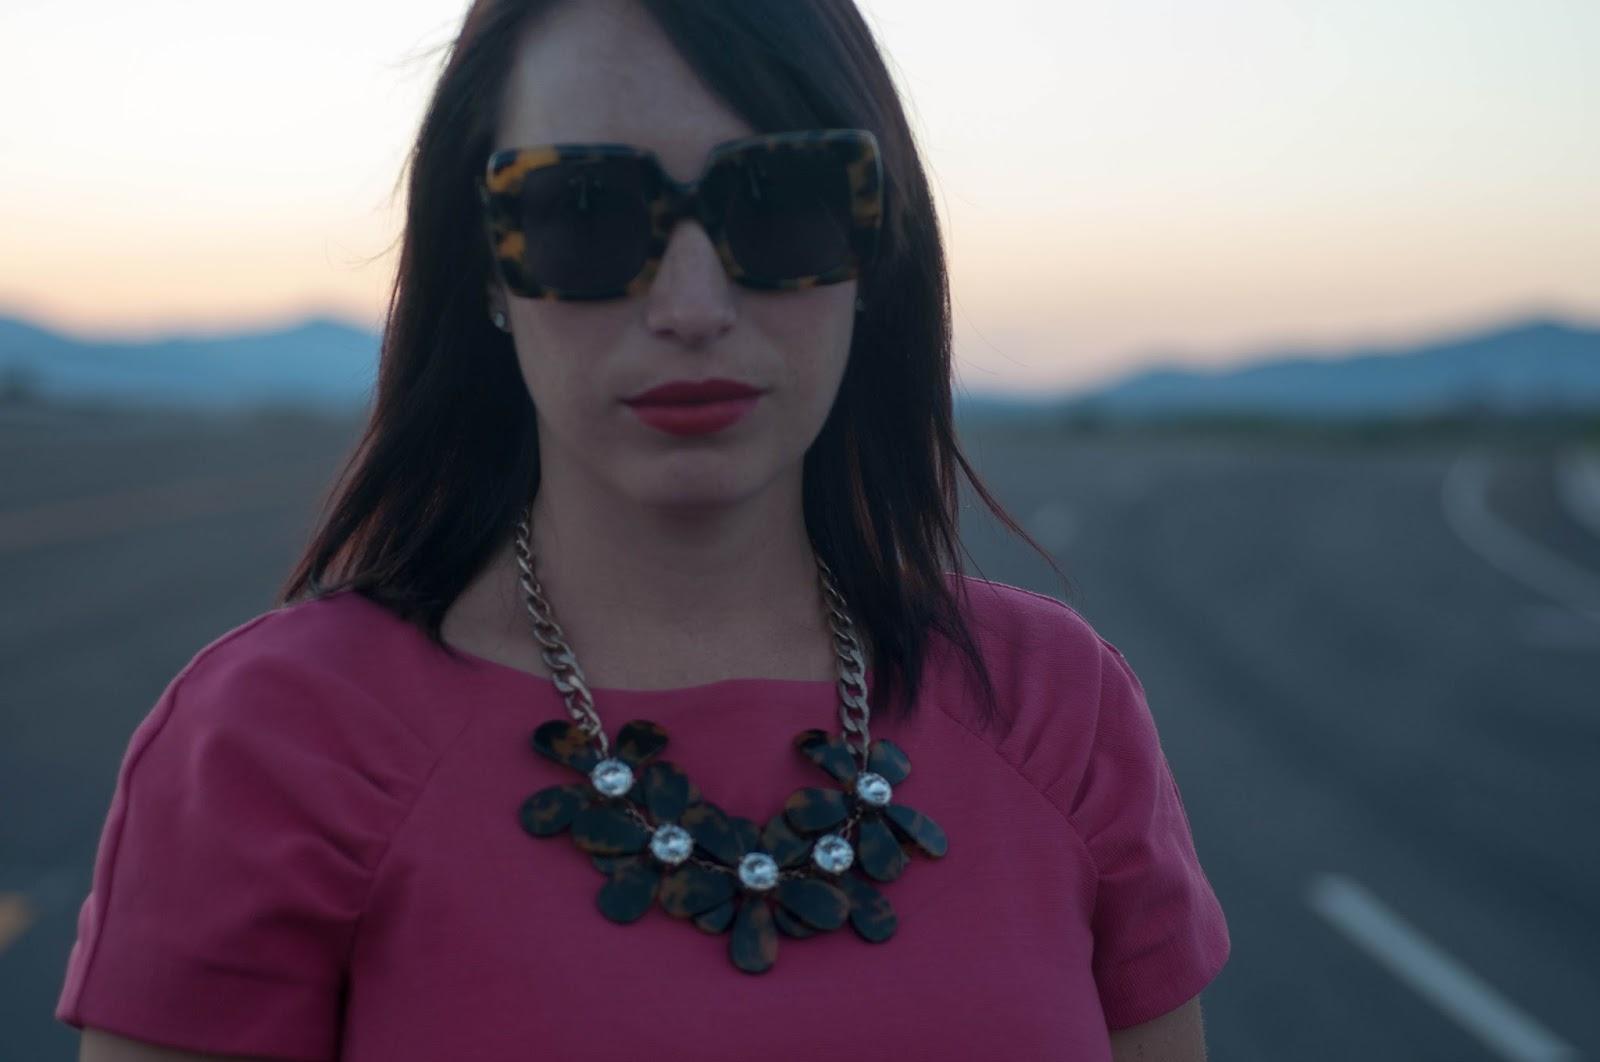 karen walker sunglasses, jcrew floral necklace, banana republic dress, hot pink dress, karen walker sunglasses, ootd, kelsey bang